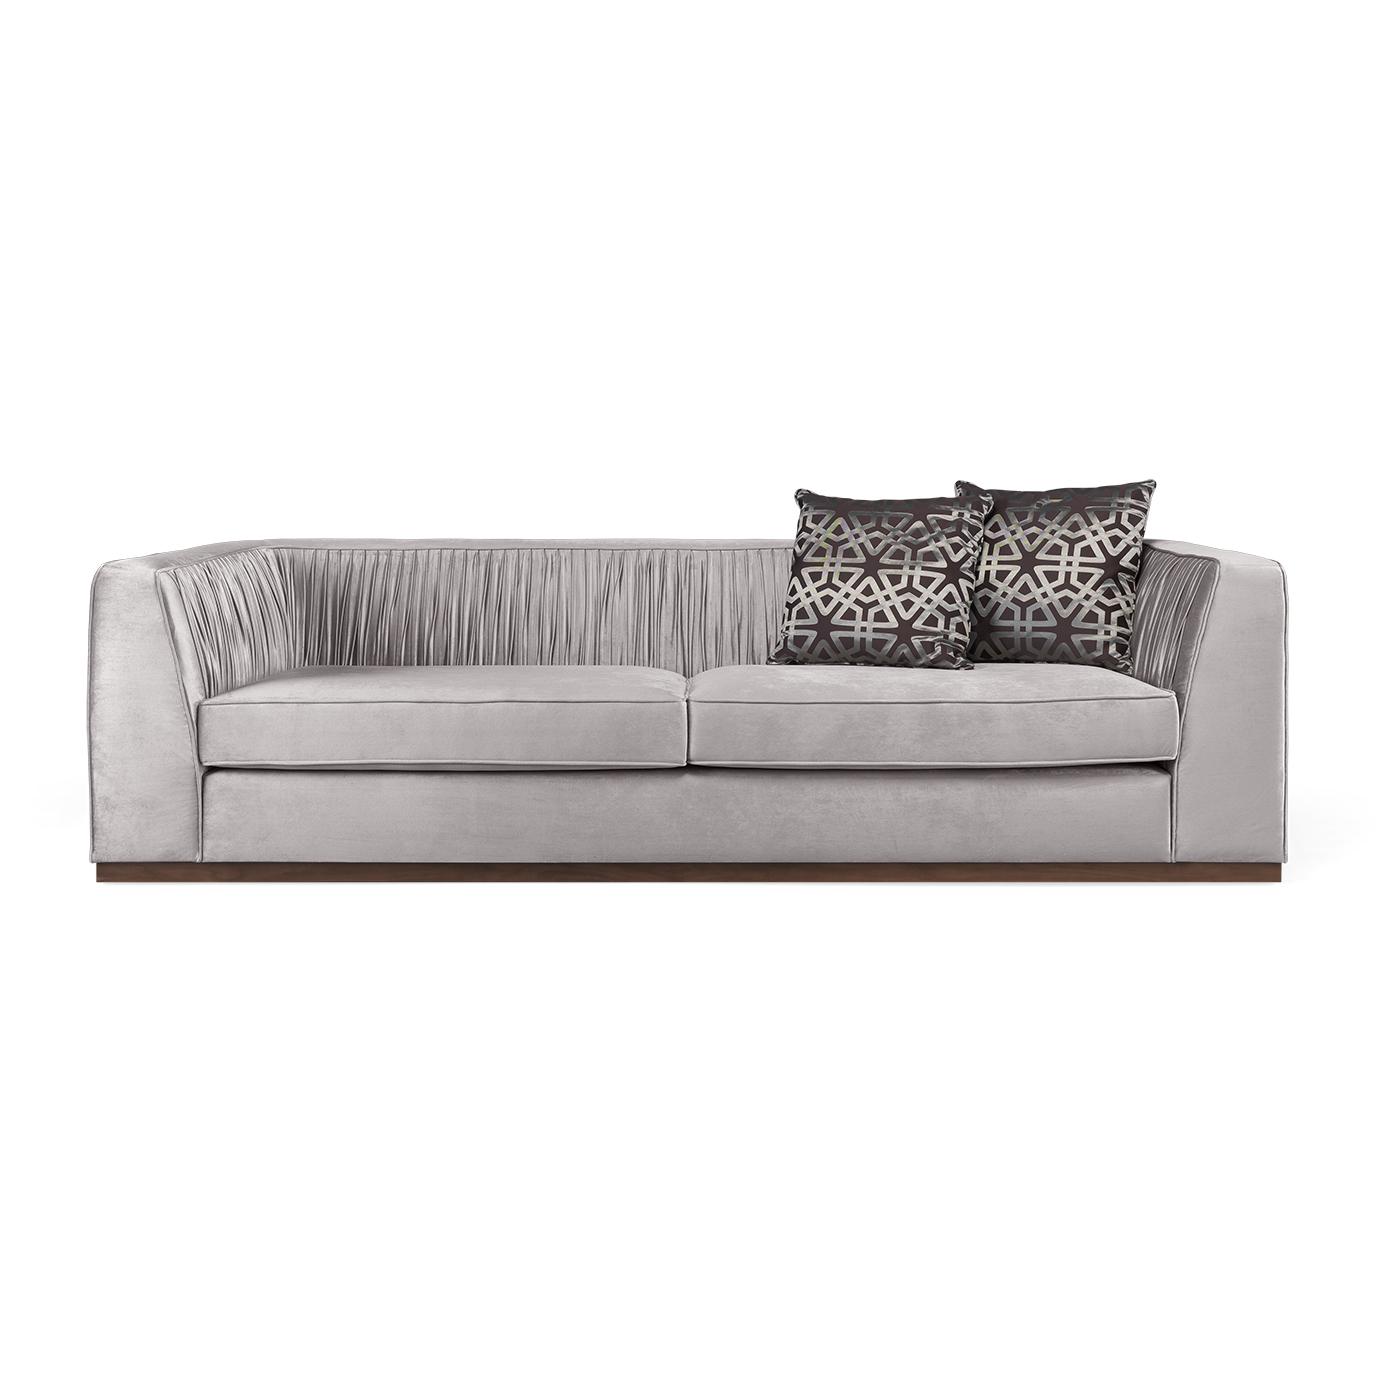 Sofas marbella house design - Sofas en marbella ...